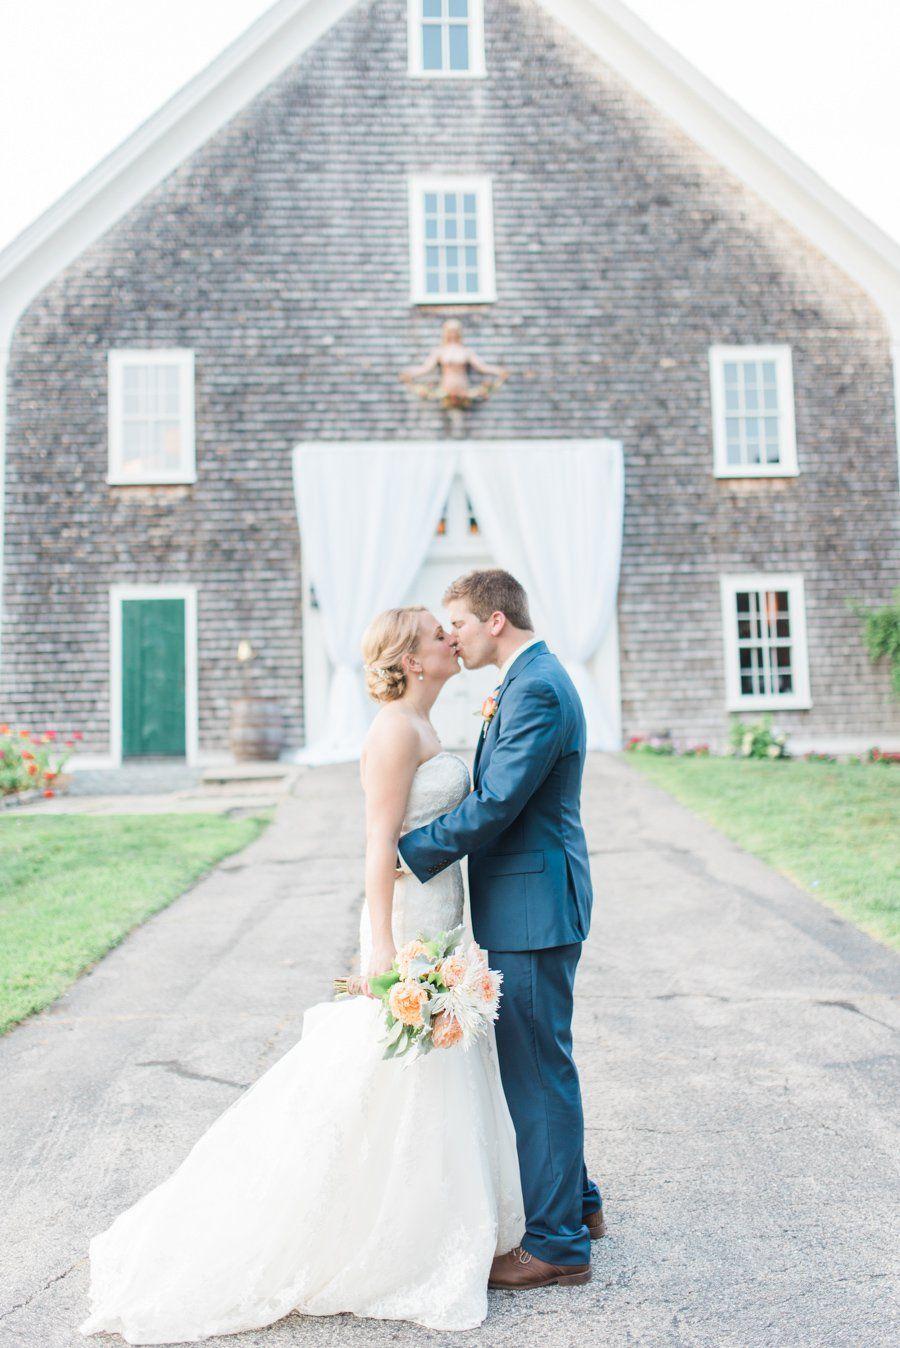 Rustic Chic Wedding Mount Hope Farm Ri: Lighthouse Wedding Venue Ri At Reisefeber.org